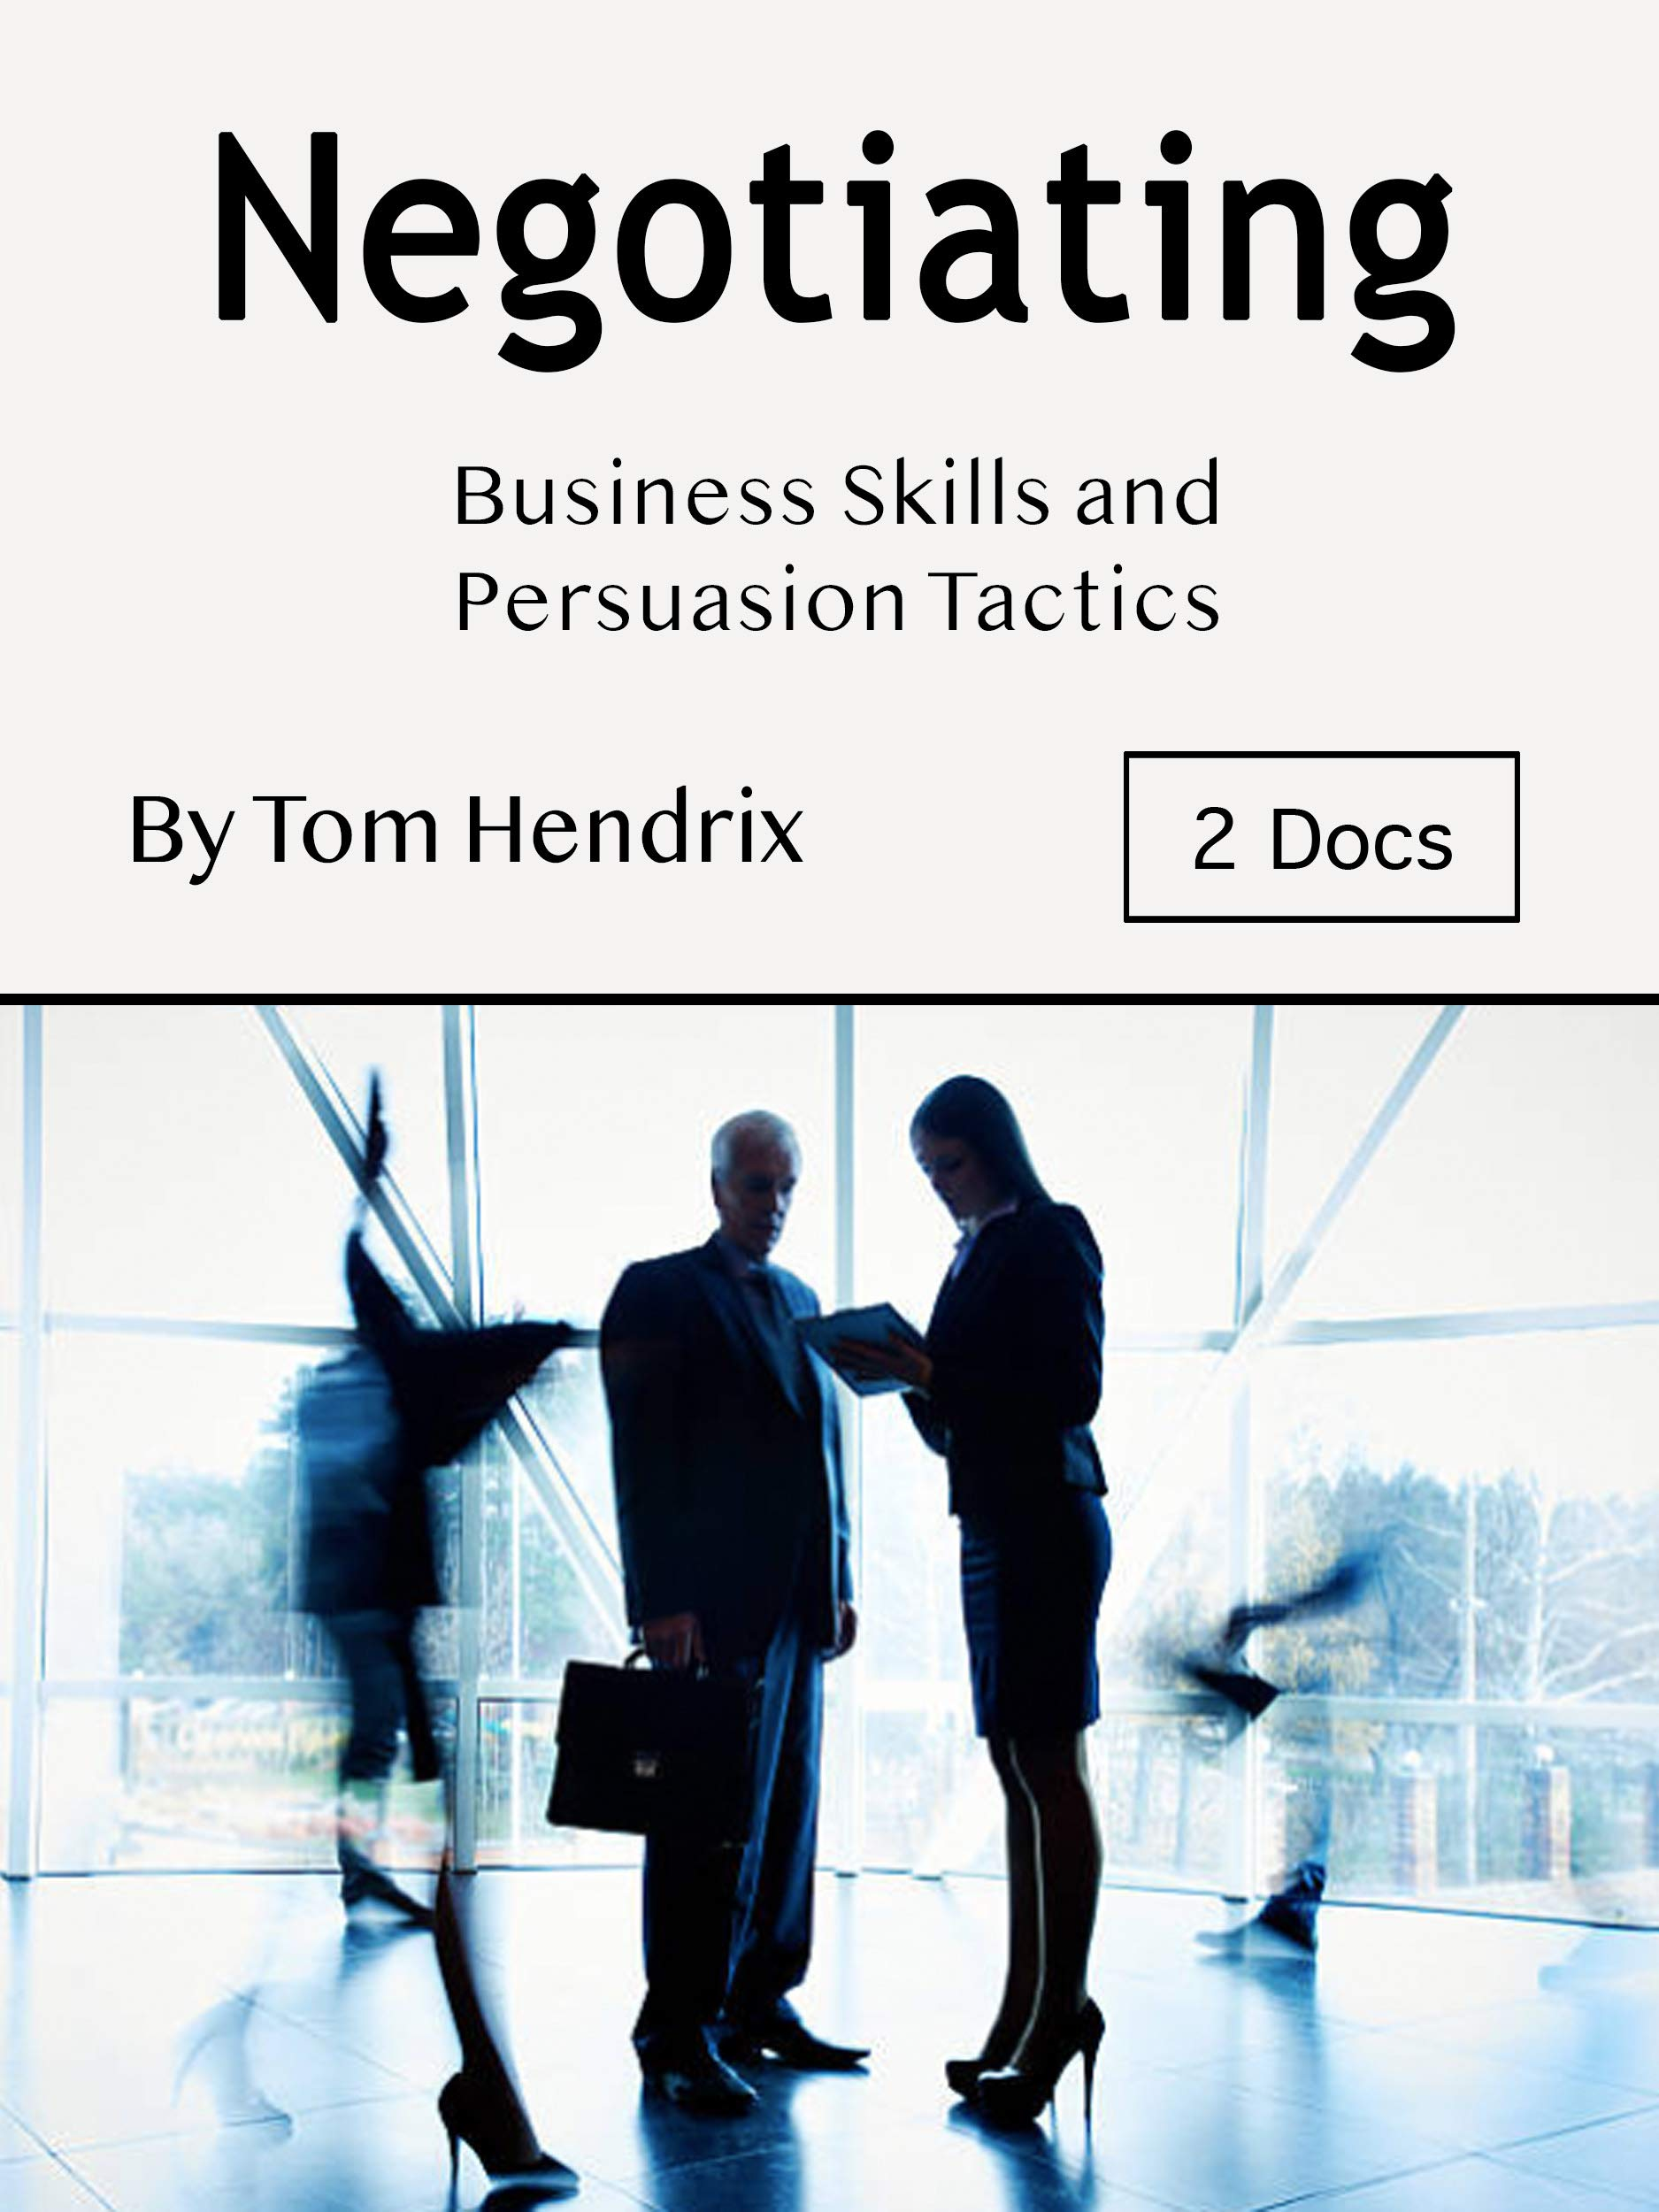 Negotiating: Business Skills and Persuasion Tactics